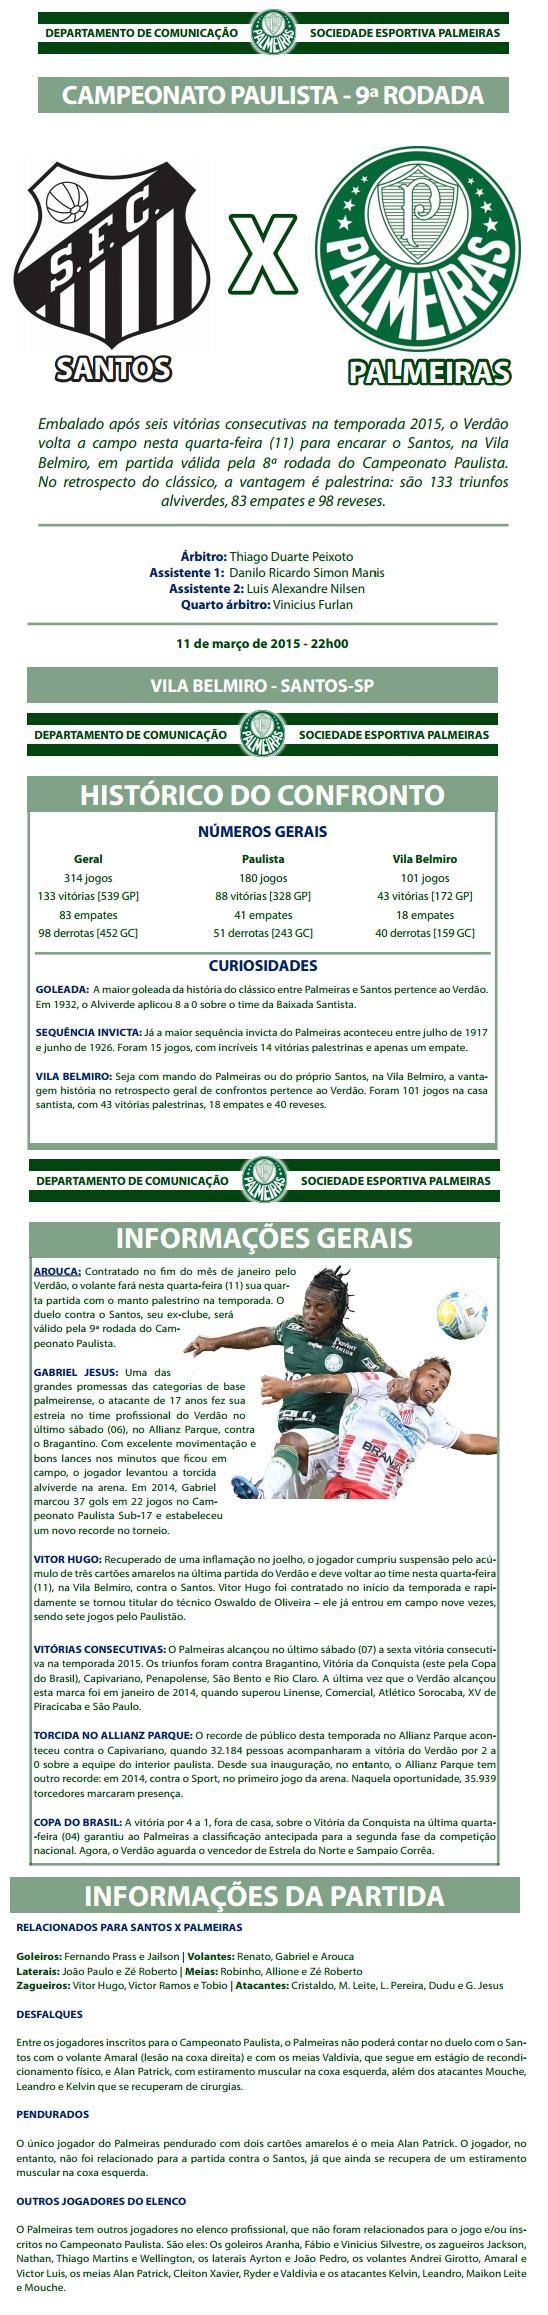 Palmeiras Santos paulista 2015